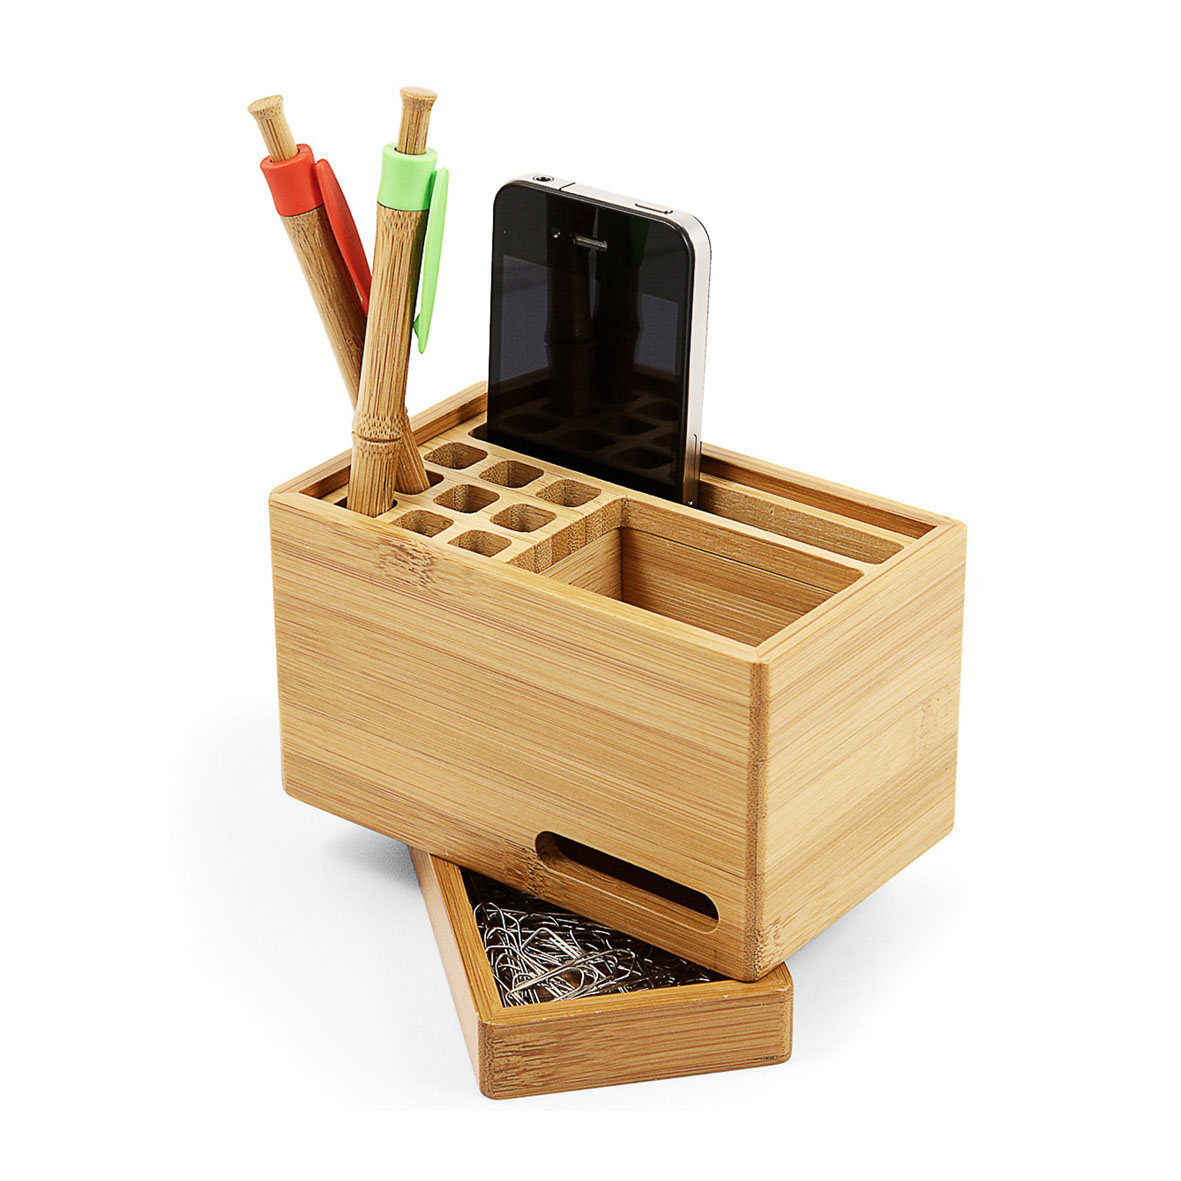 boite stylo 01 la clique bill agence de communication globale. Black Bedroom Furniture Sets. Home Design Ideas